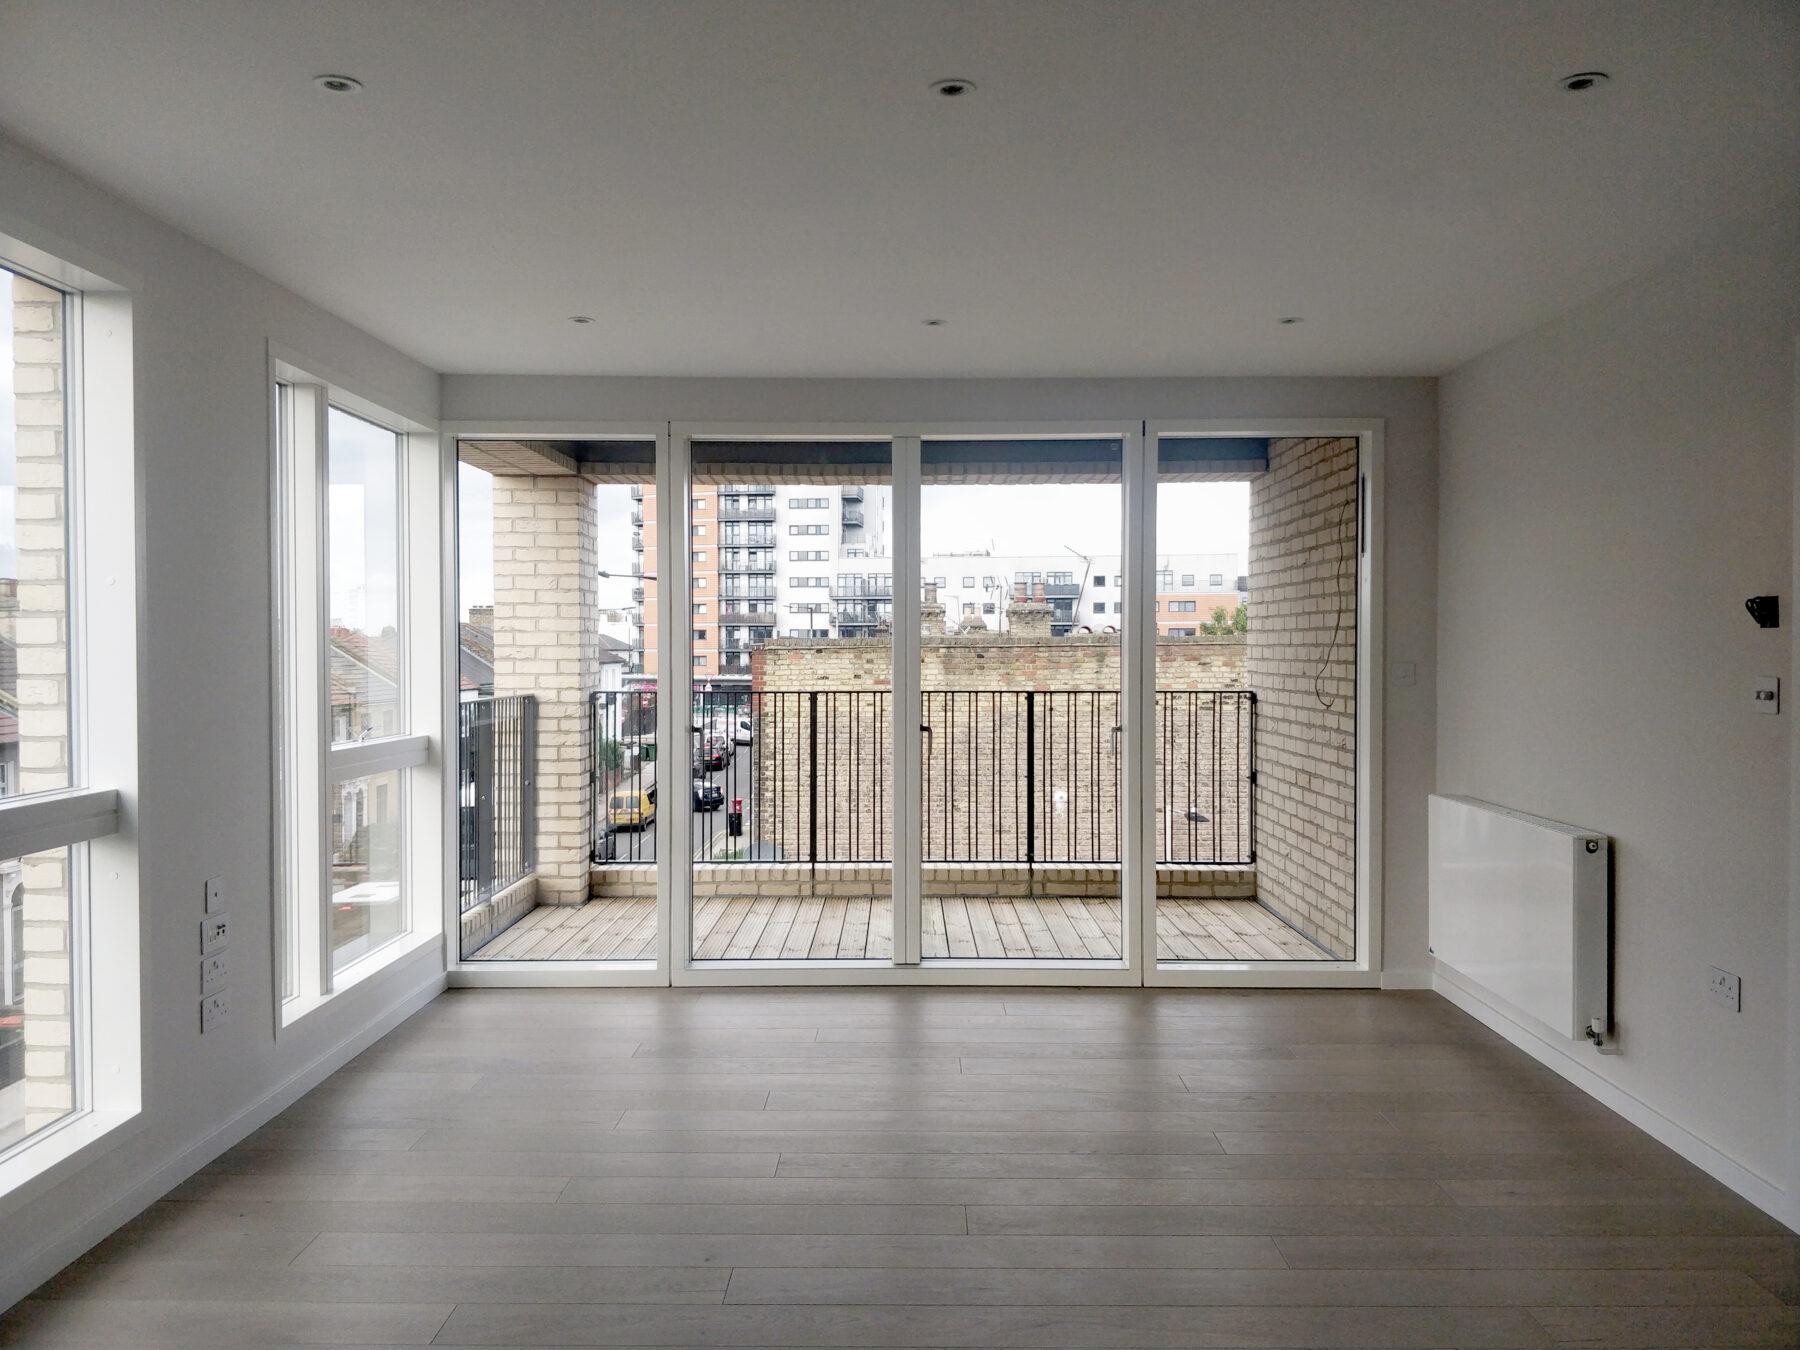 Water Lane Residential New Build Community Living Room Balcony Brick